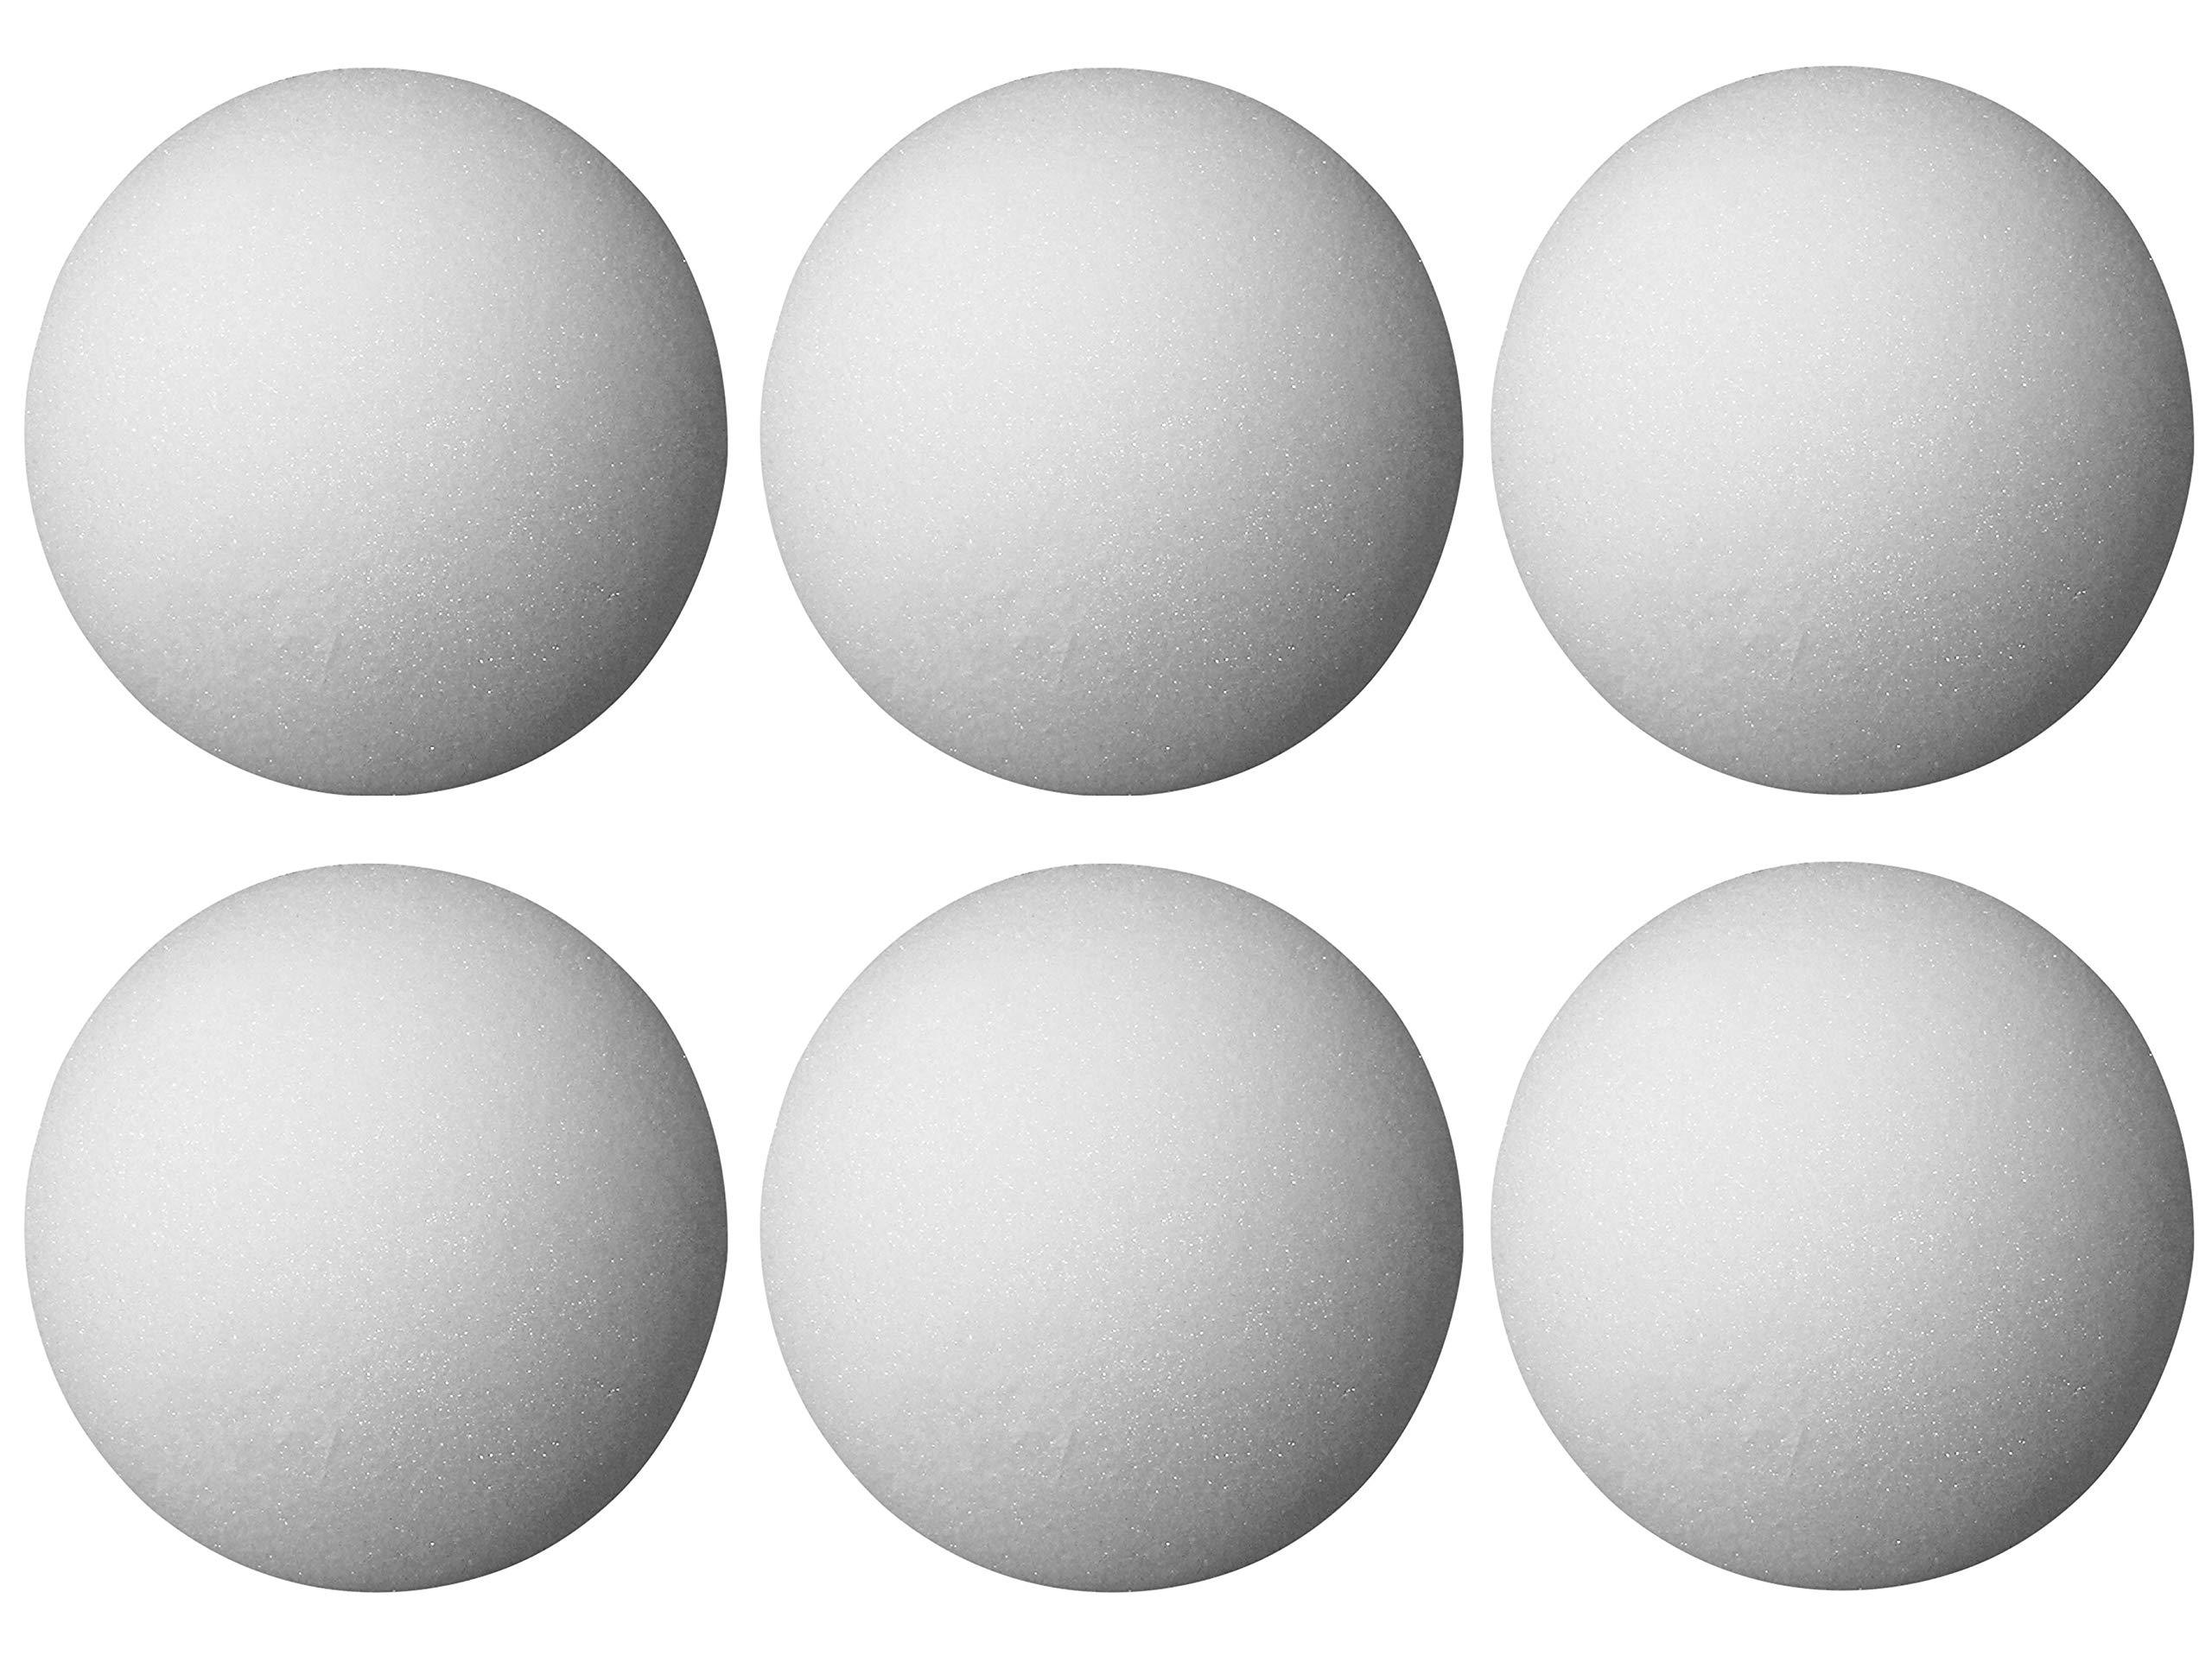 FloraCraft Styrofoam Ball: White, 3 inches, 6 Pieces (Вundlе оf Fоur)